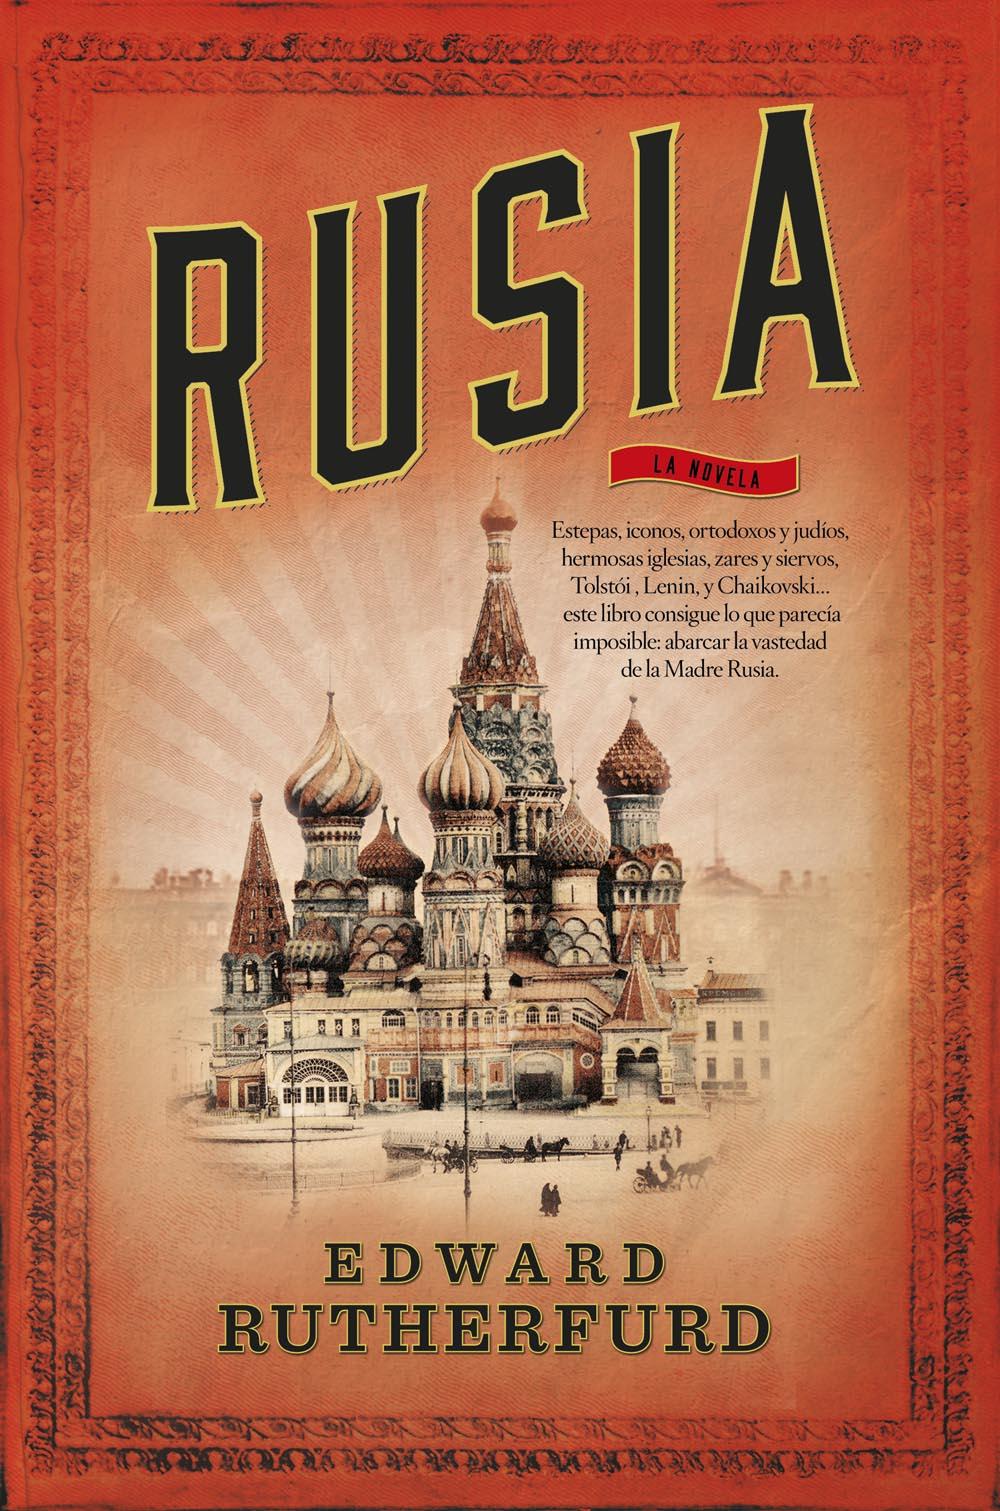 9788499187747-Rusia-Edward_Rutherfurd-Roca-2014_baja